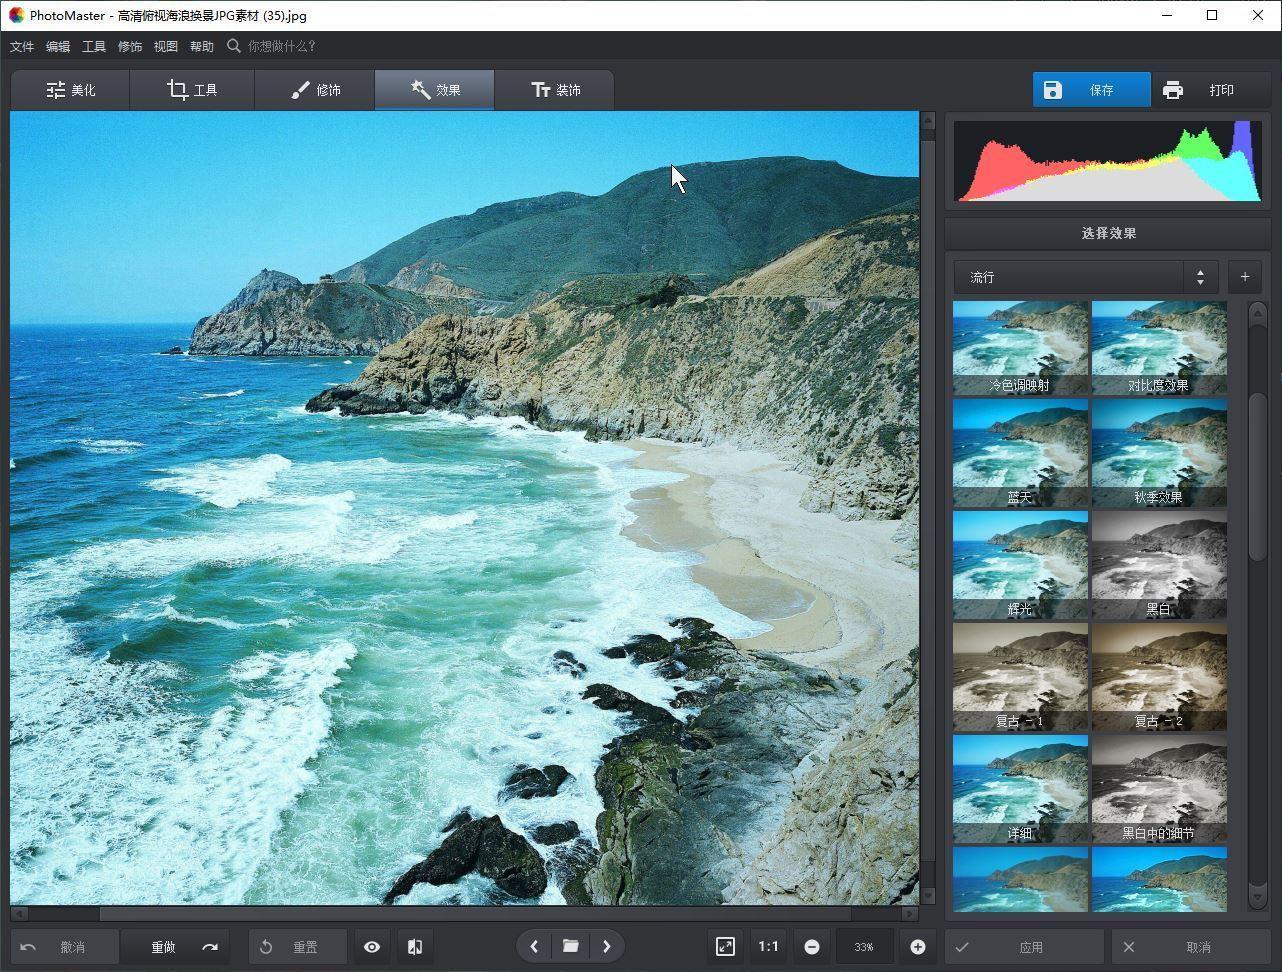 VIP资源-智能图像编辑软件AMS Software PhotoWorks/PhotoMaster 10.0中文直装版(7)